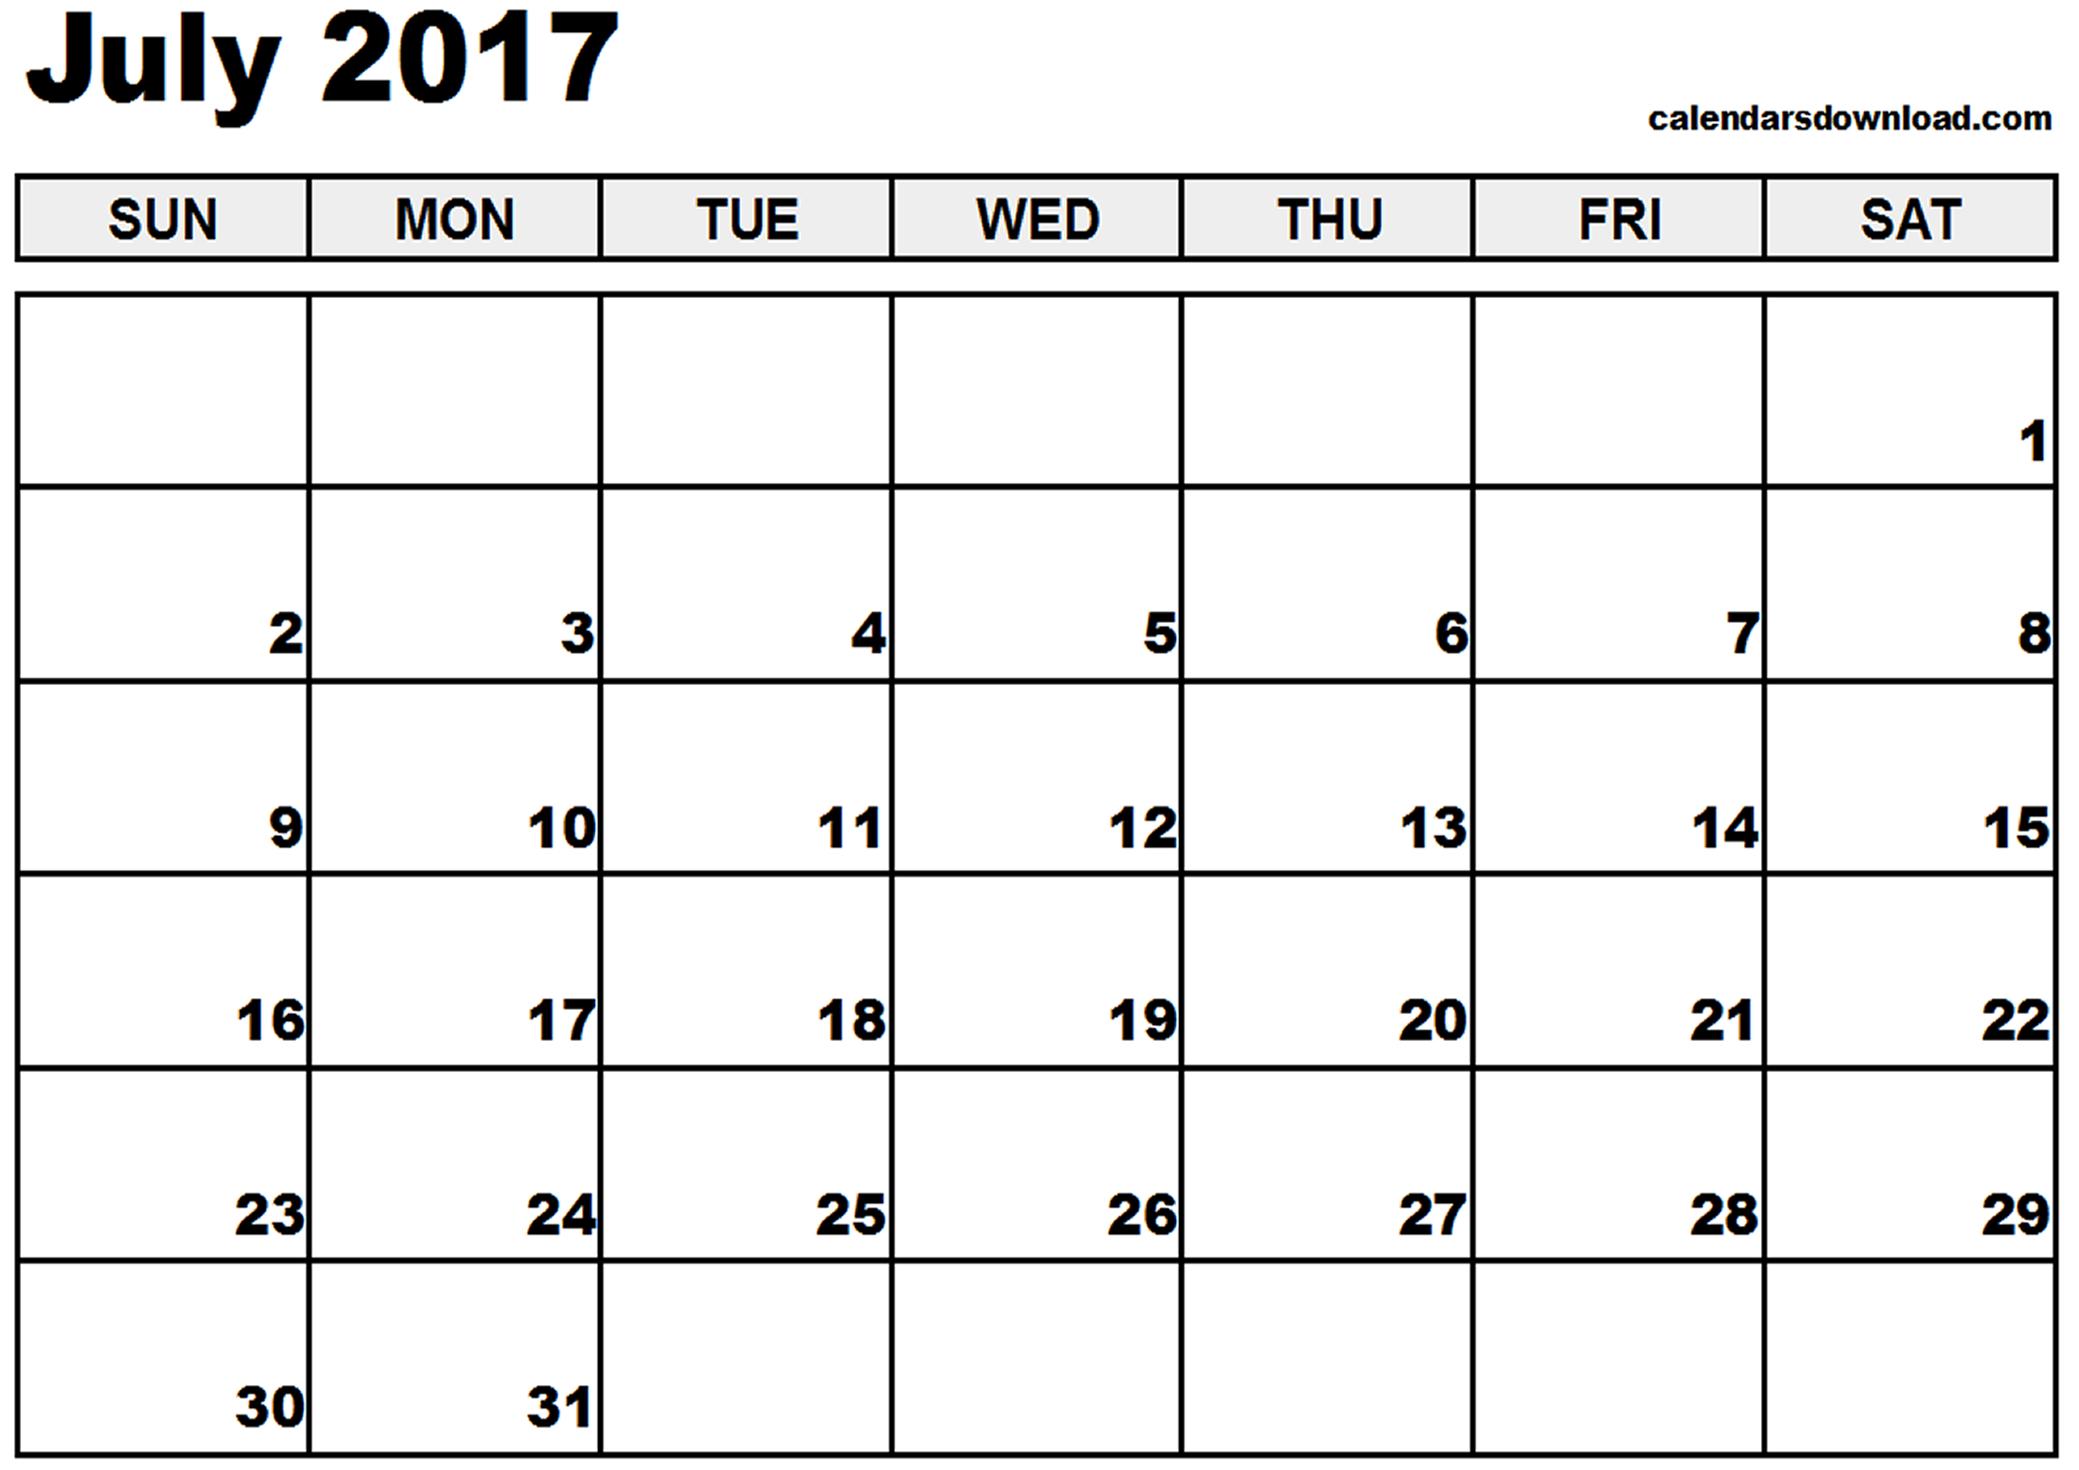 July 2017 Calendar | weekly calendar template